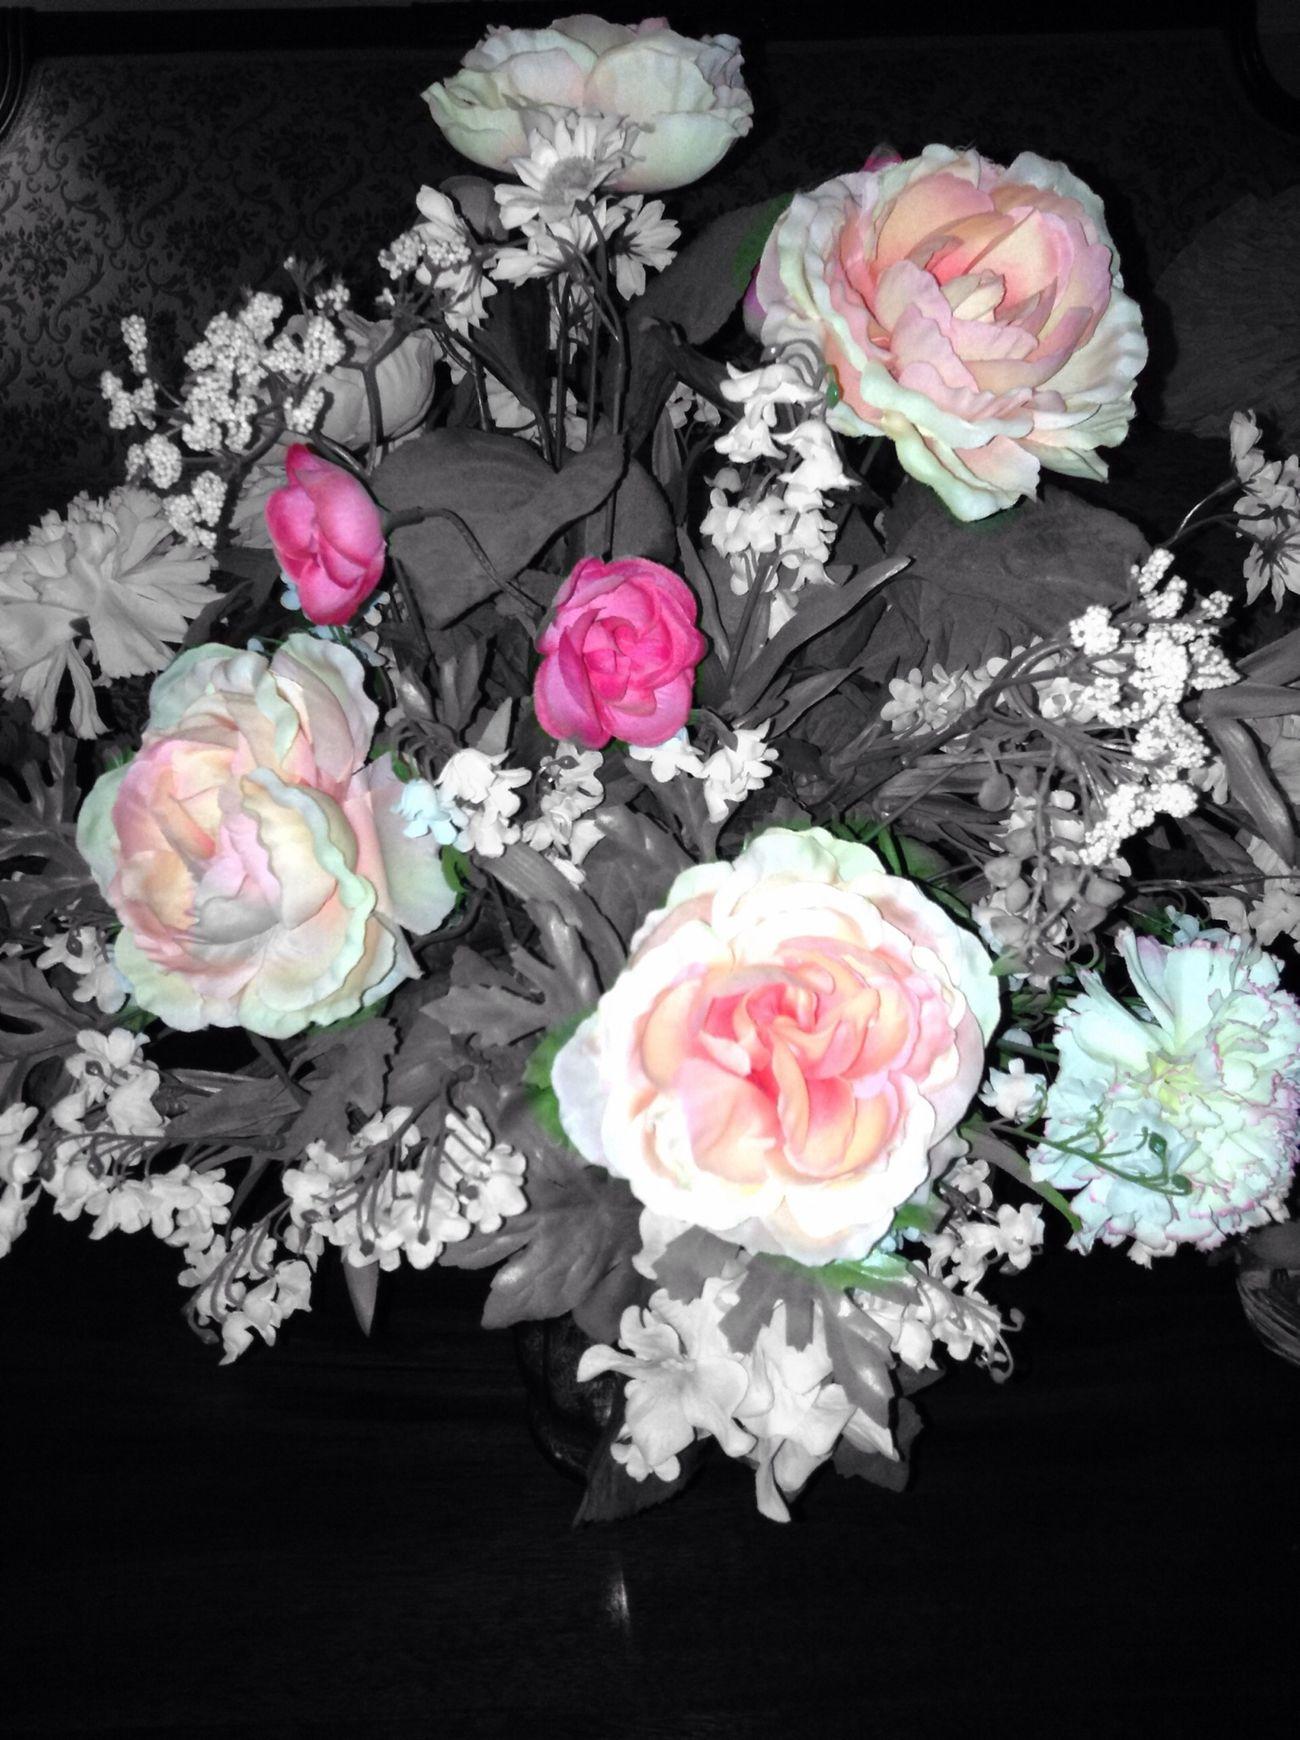 Cute♡ Flowers Tumblr ♡  Heart. Say hello